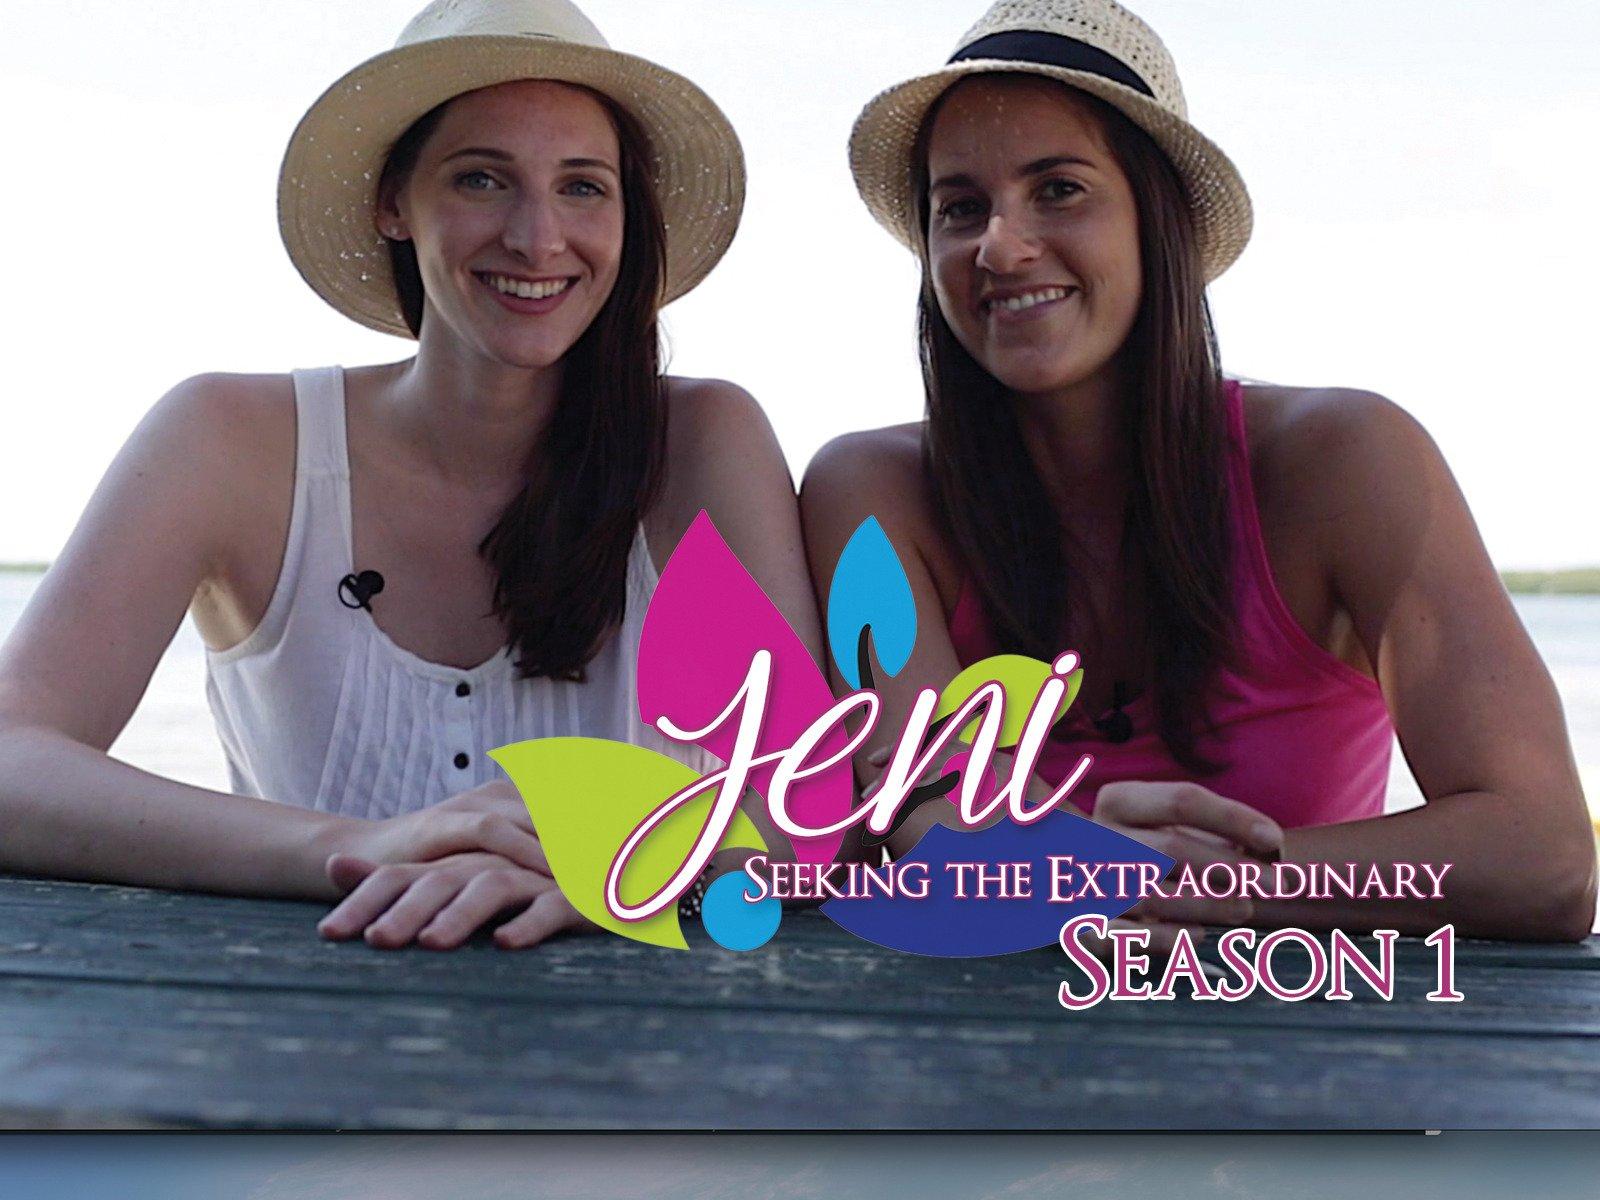 Jeni Seeking The Extraordinary Season 1 - Season 1